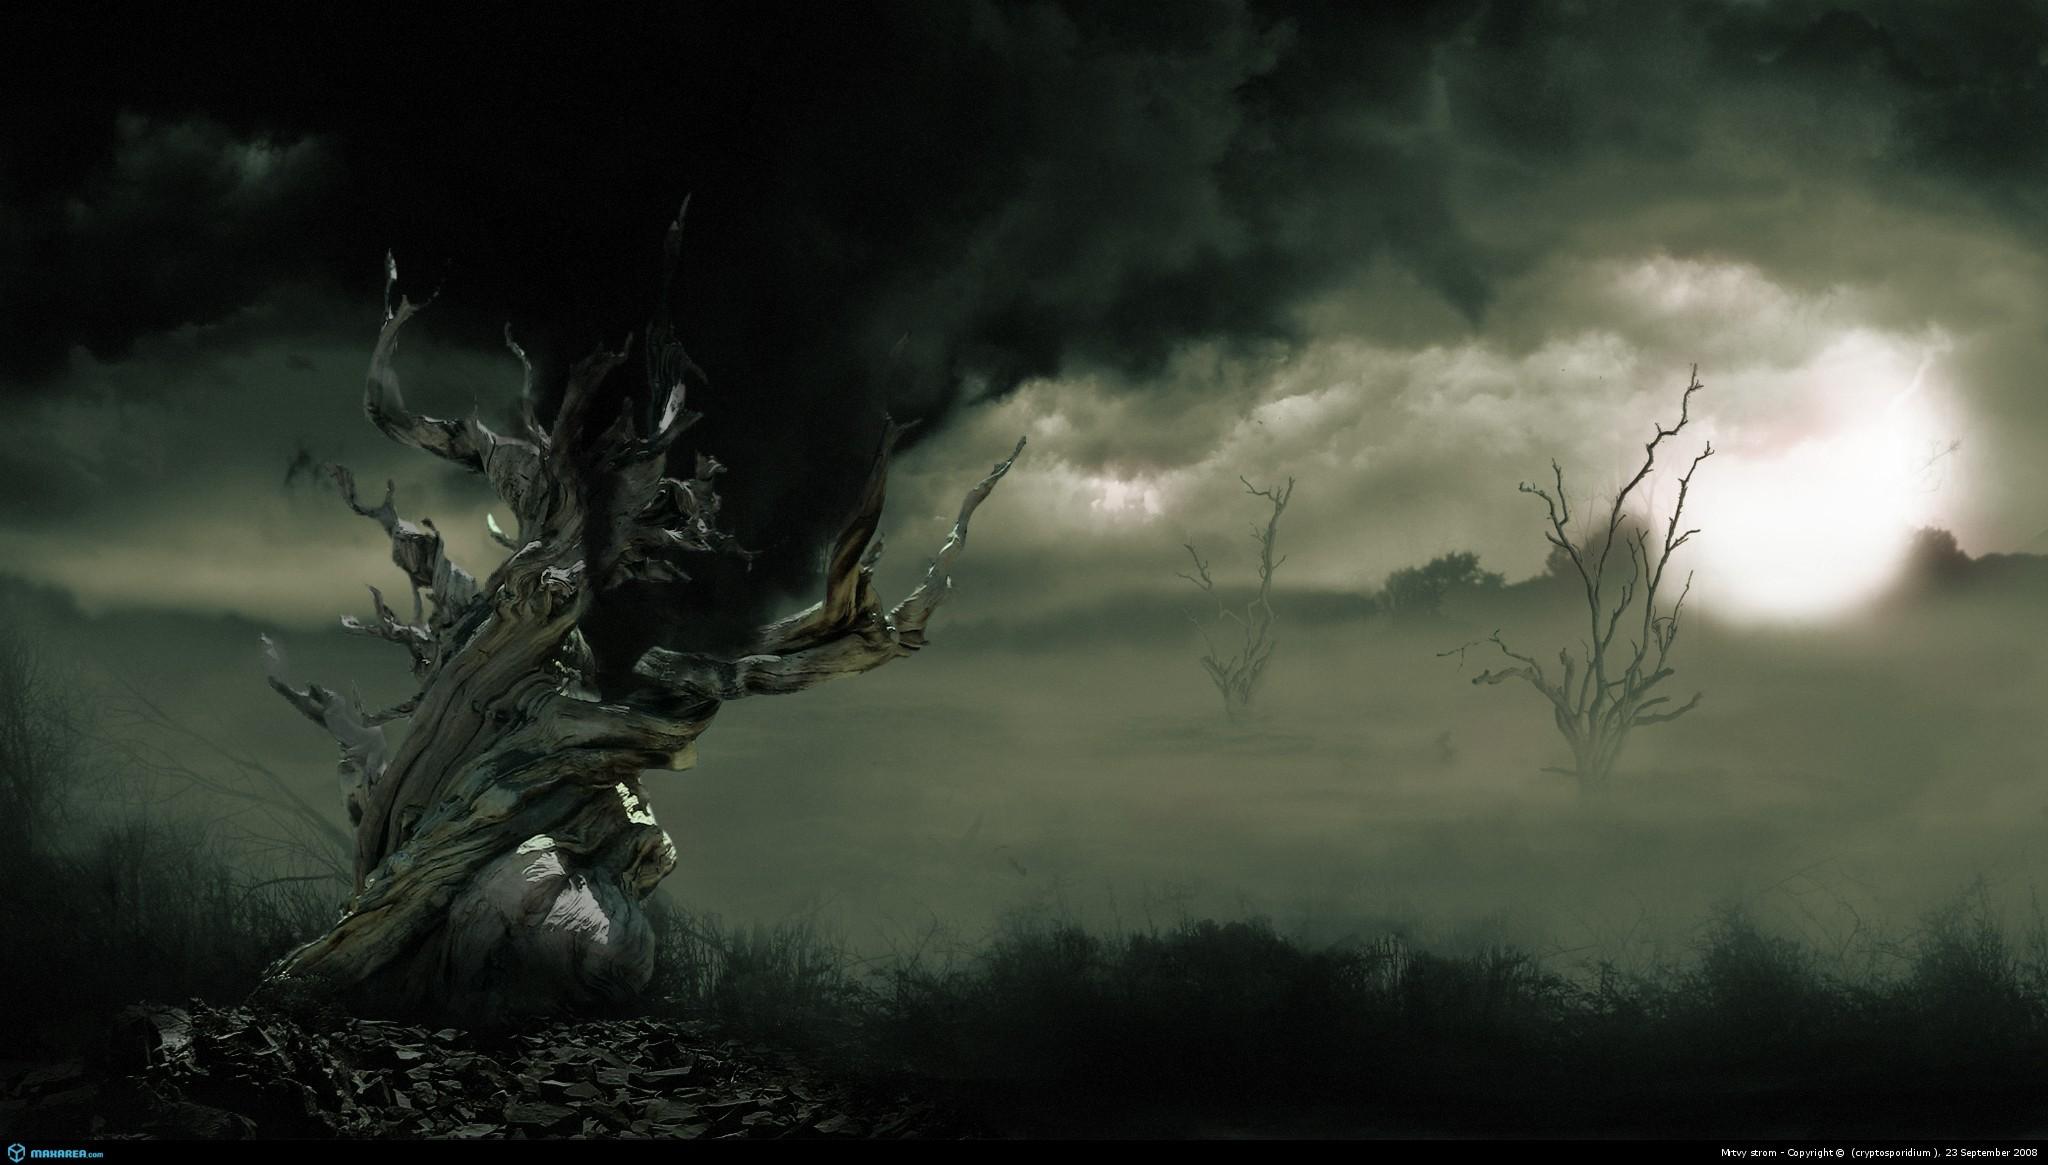 … storm wallpapers on kubipet com; hd …